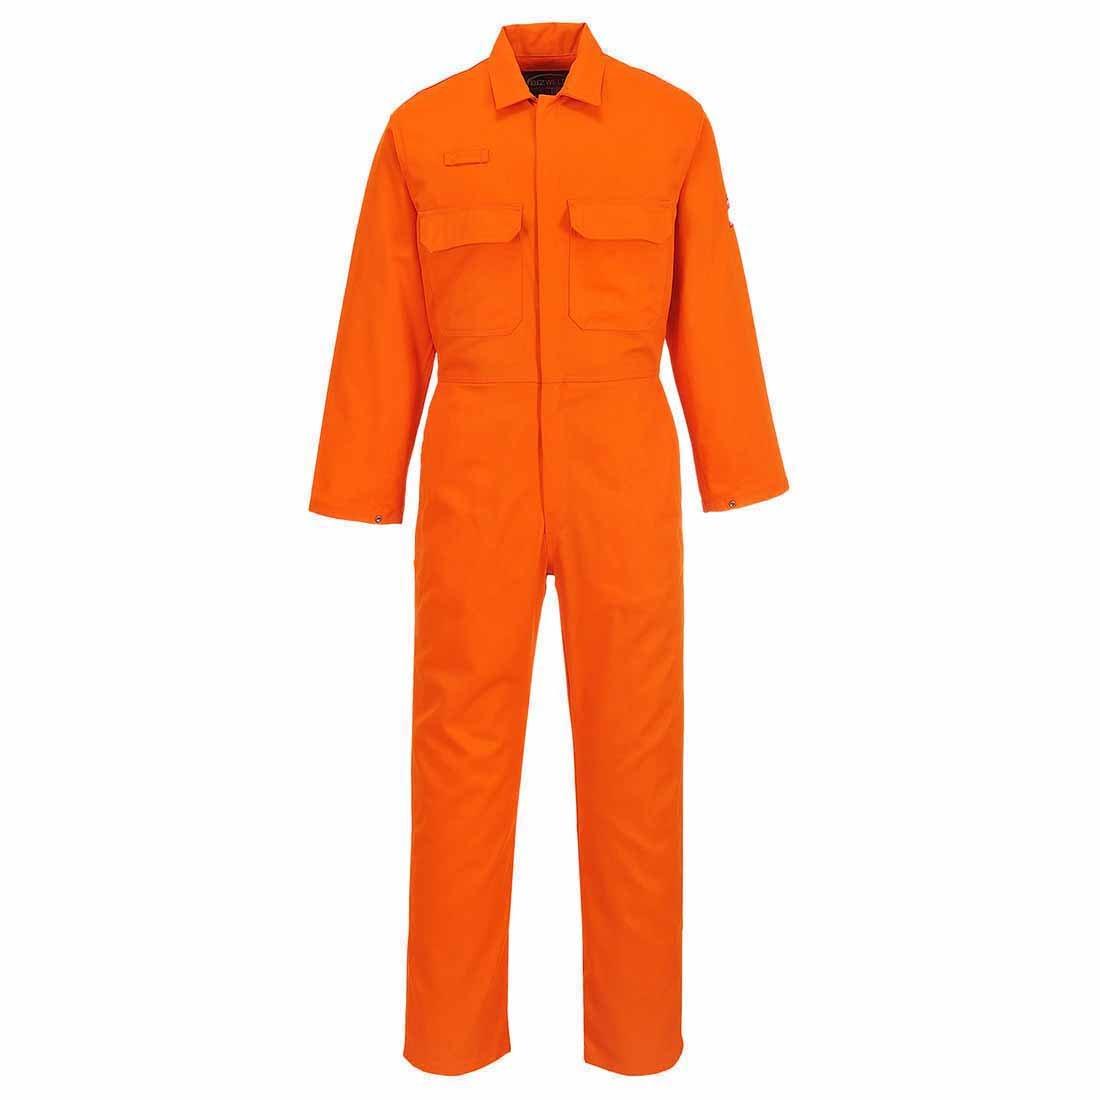 Portwest PANTS メンズ B00K70046S M|オレンジ オレンジ M